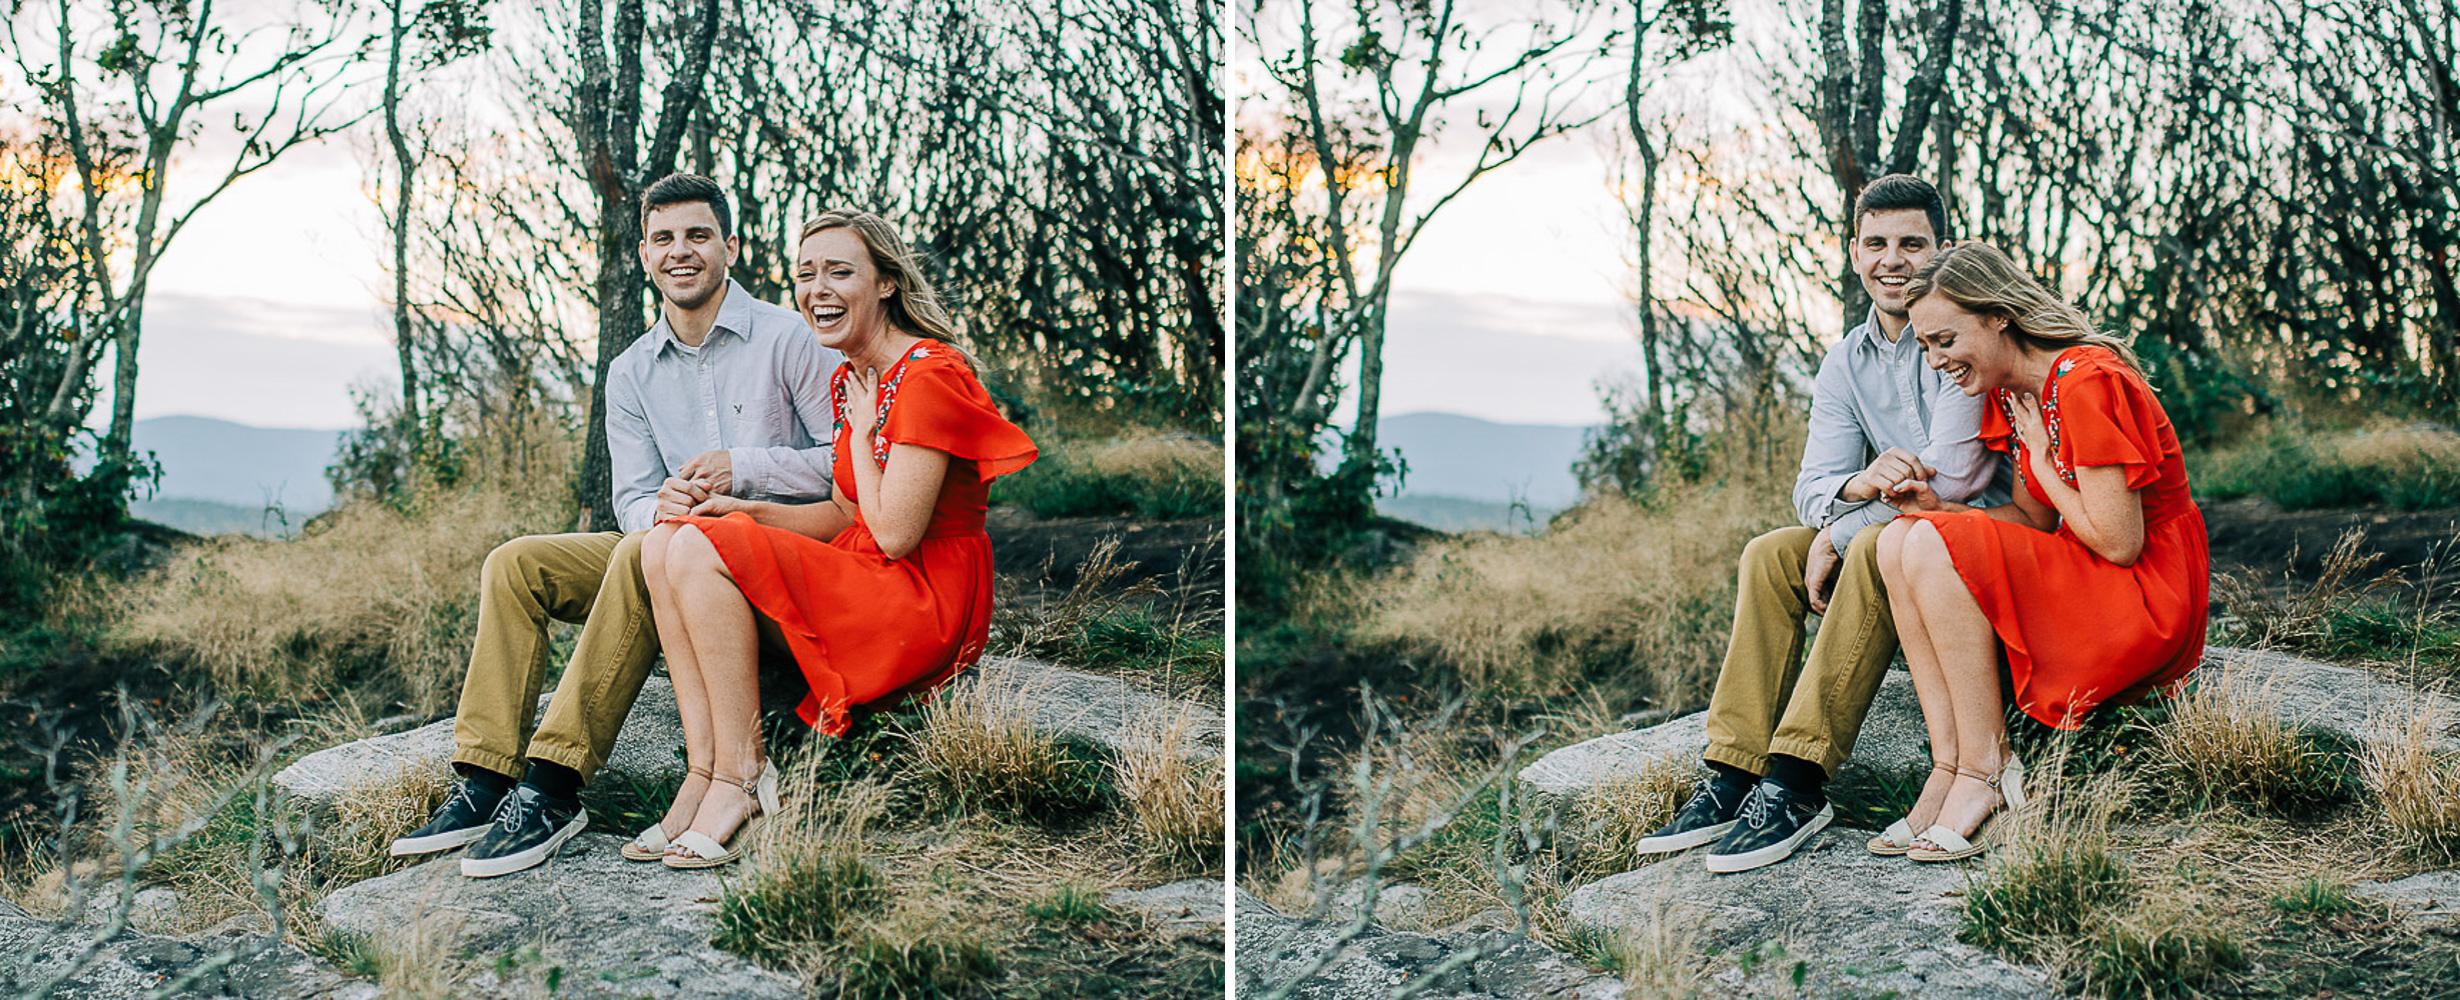 Engagement Portraits 19.jpg